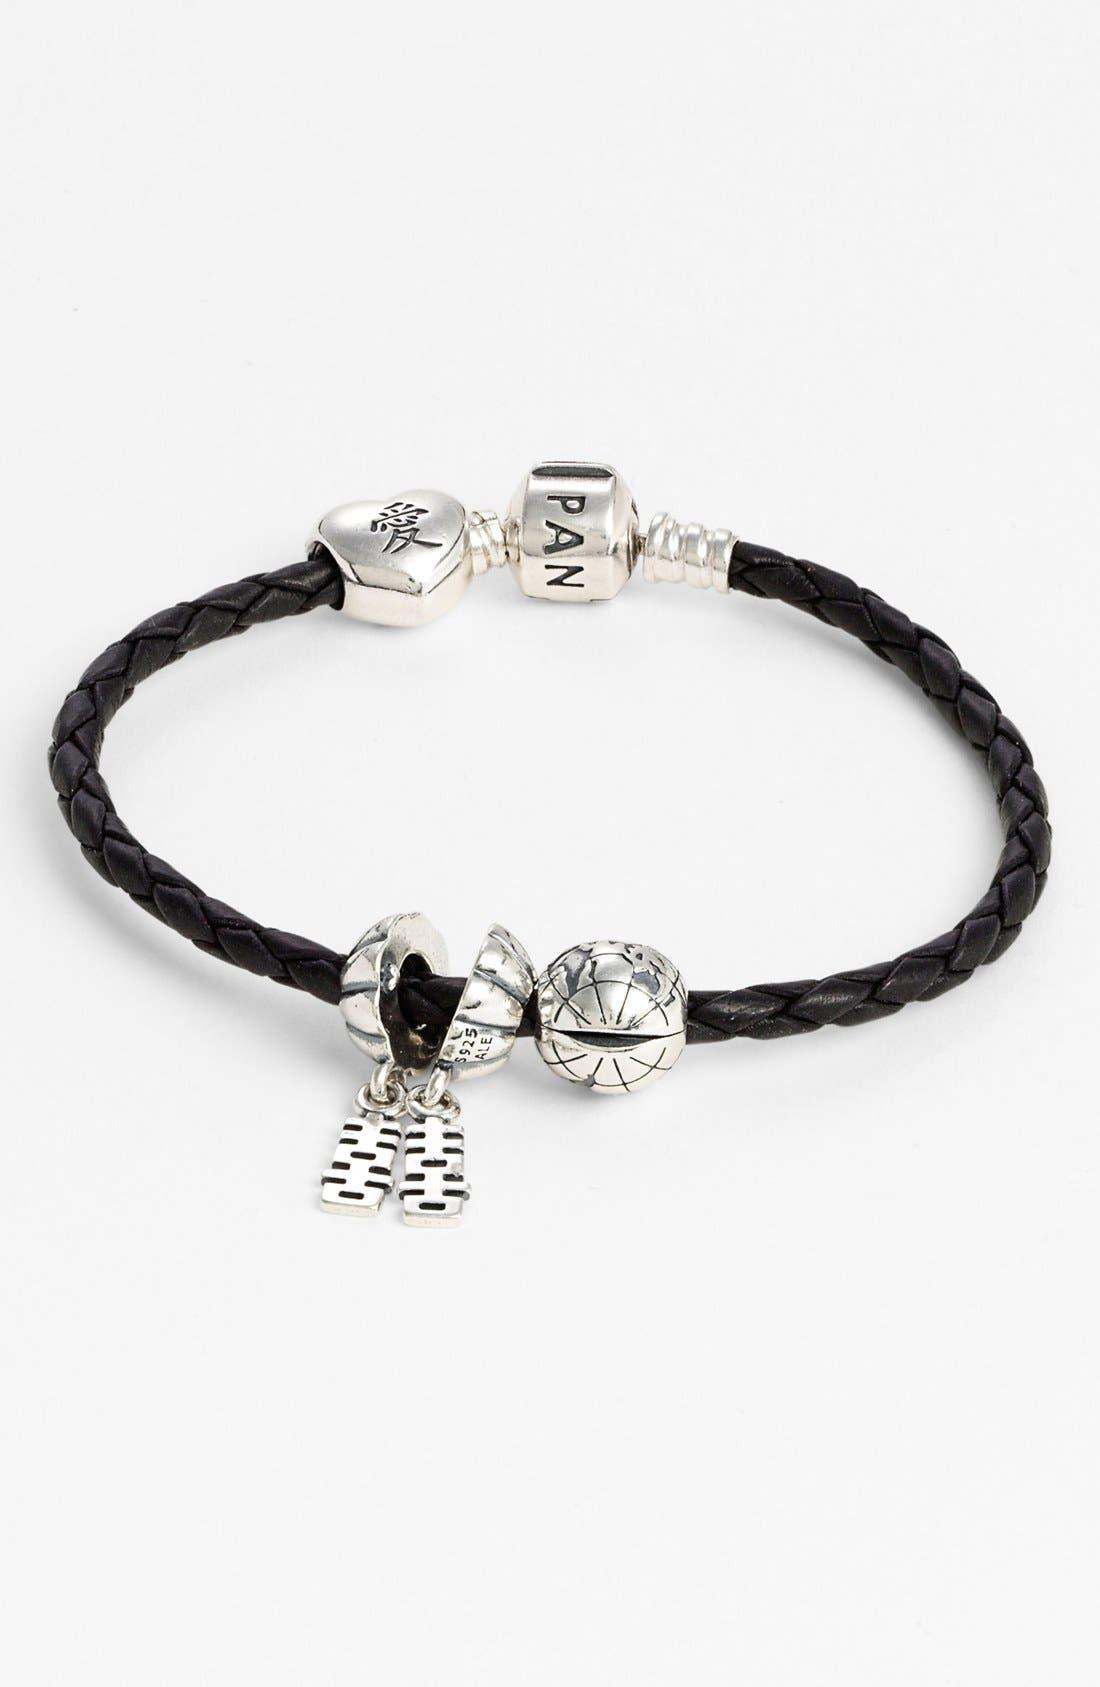 Main Image - PANDORA Leather Bracelet & Charms